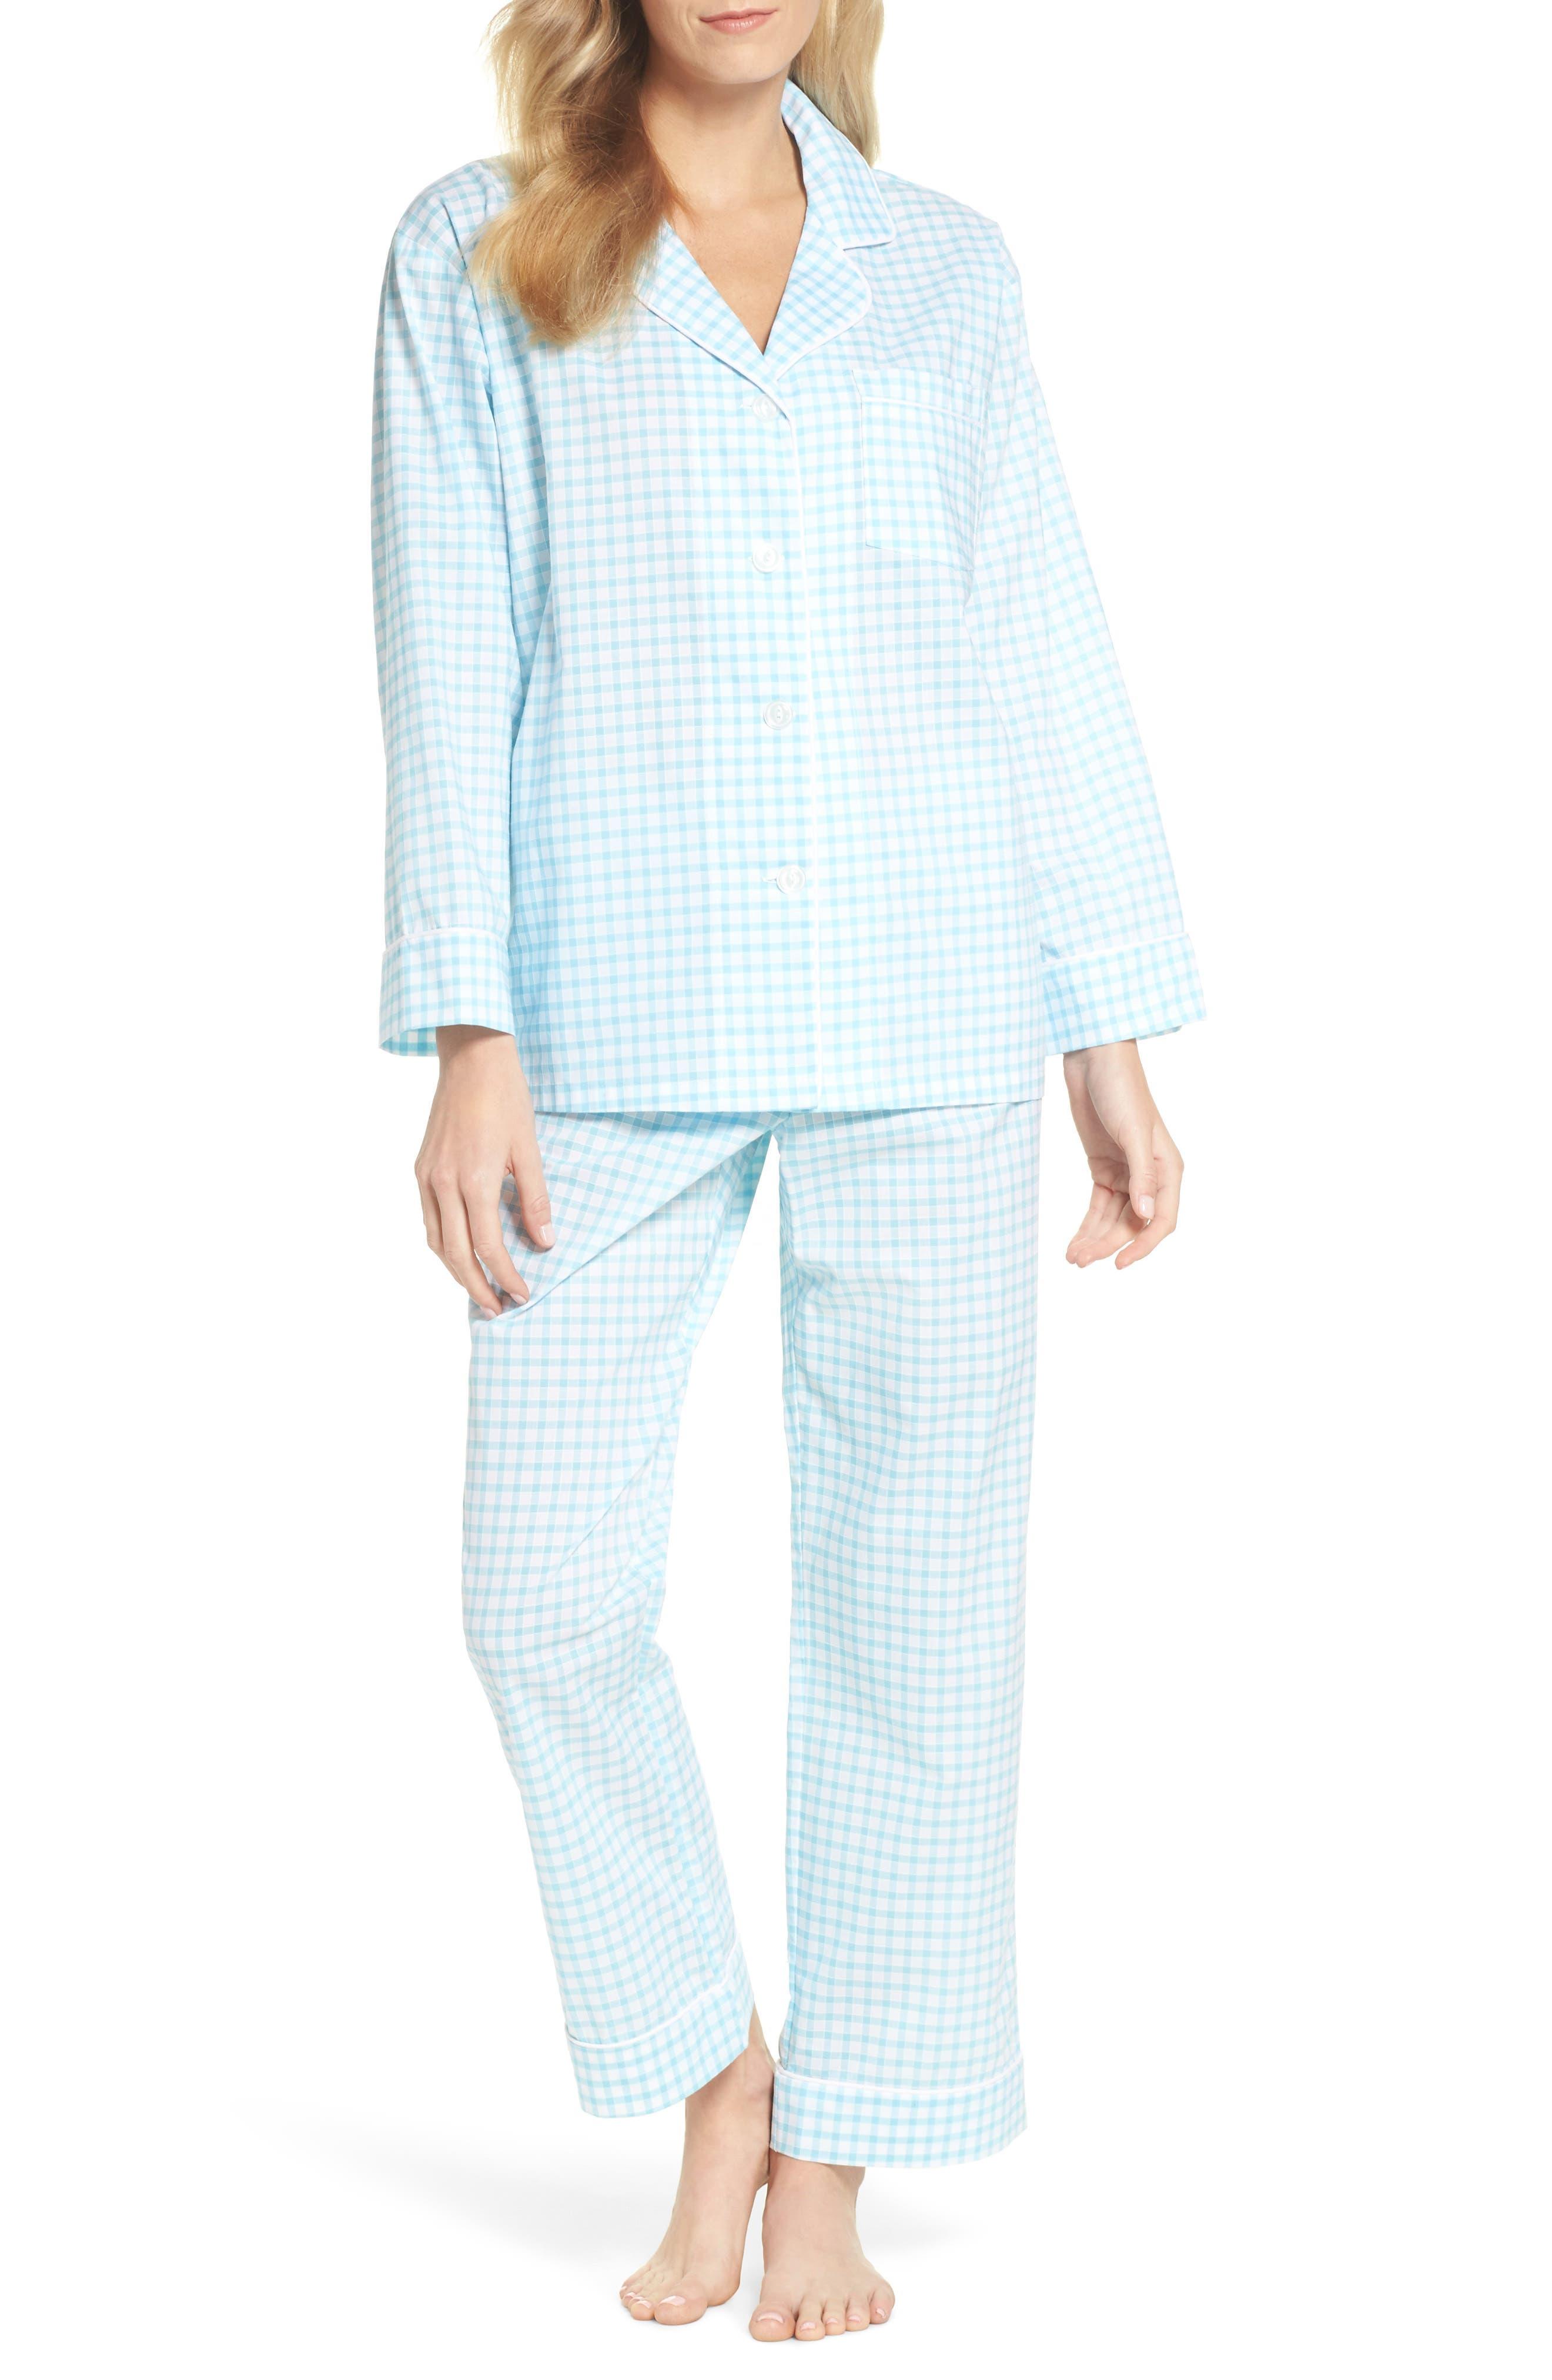 Gingham Pajamas,                         Main,                         color, 439